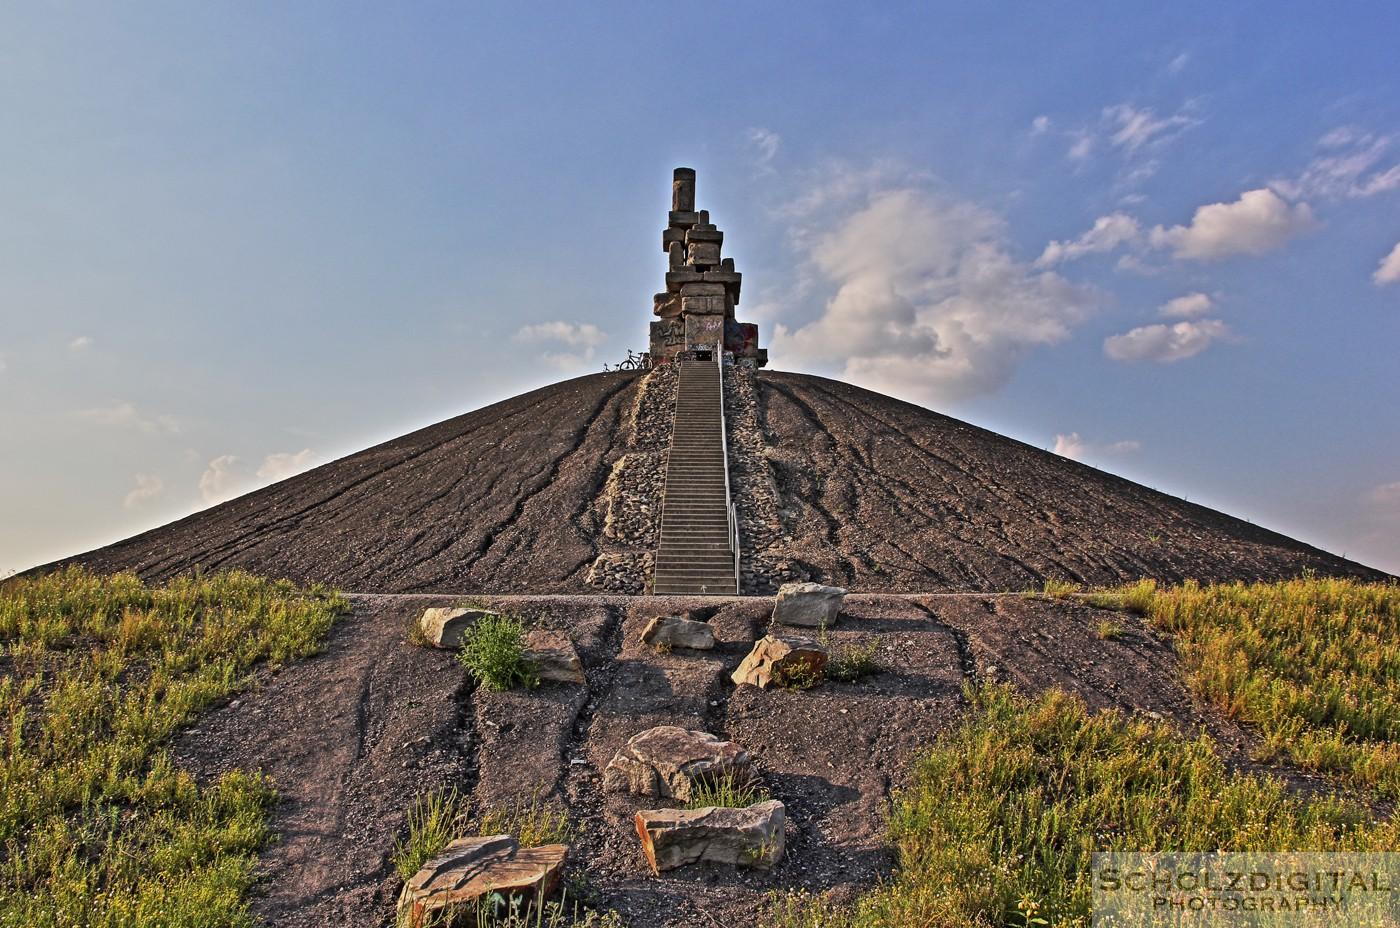 Himmelstreppe in Gelsenkirchen